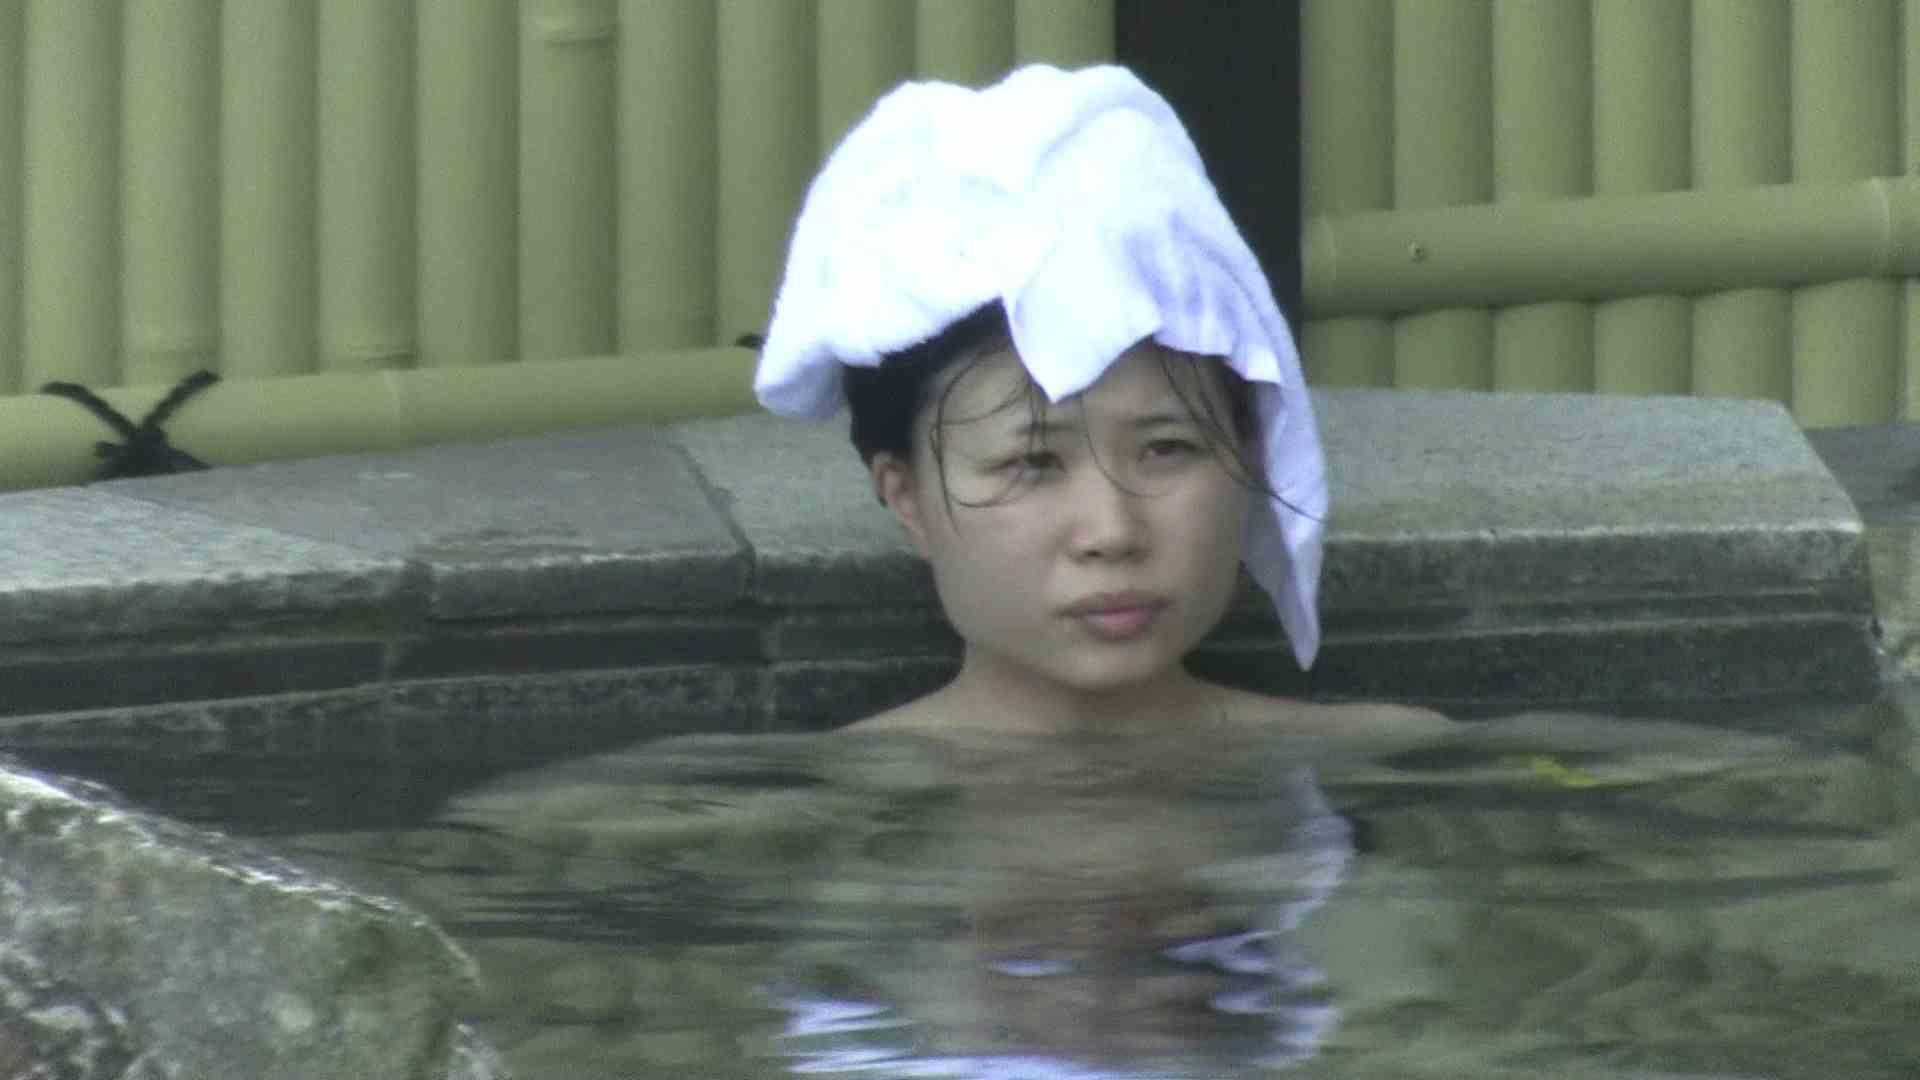 Aquaな露天風呂Vol.183 盗撮 | OLセックス  69画像 46